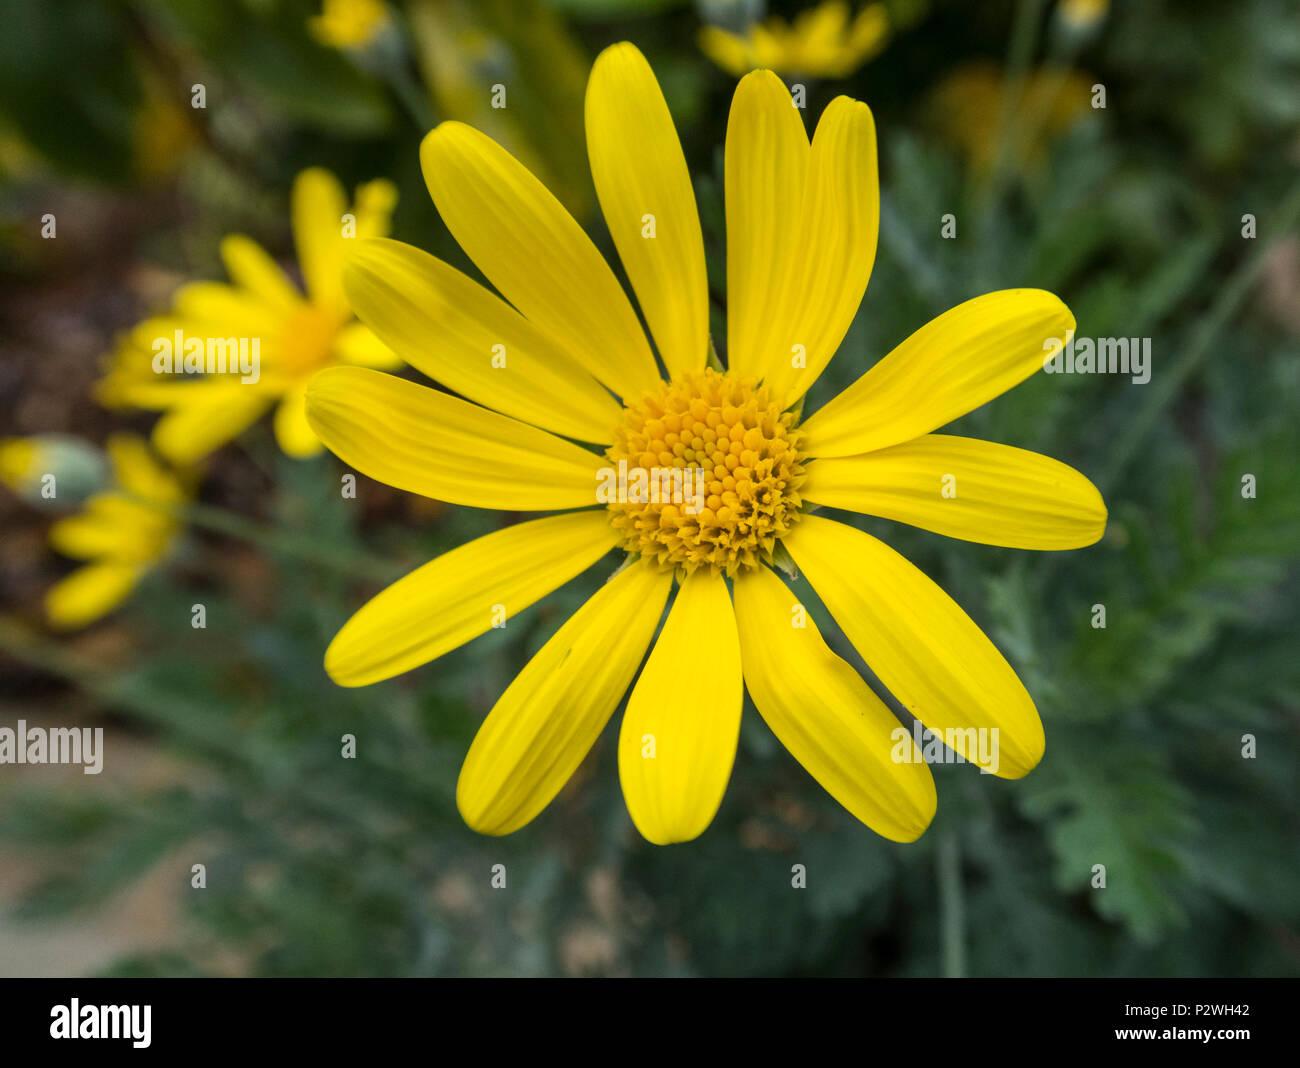 Euryops pectinatus, the grey-leaved euryops,yellow flowering aster, Asteraceae - Stock Image